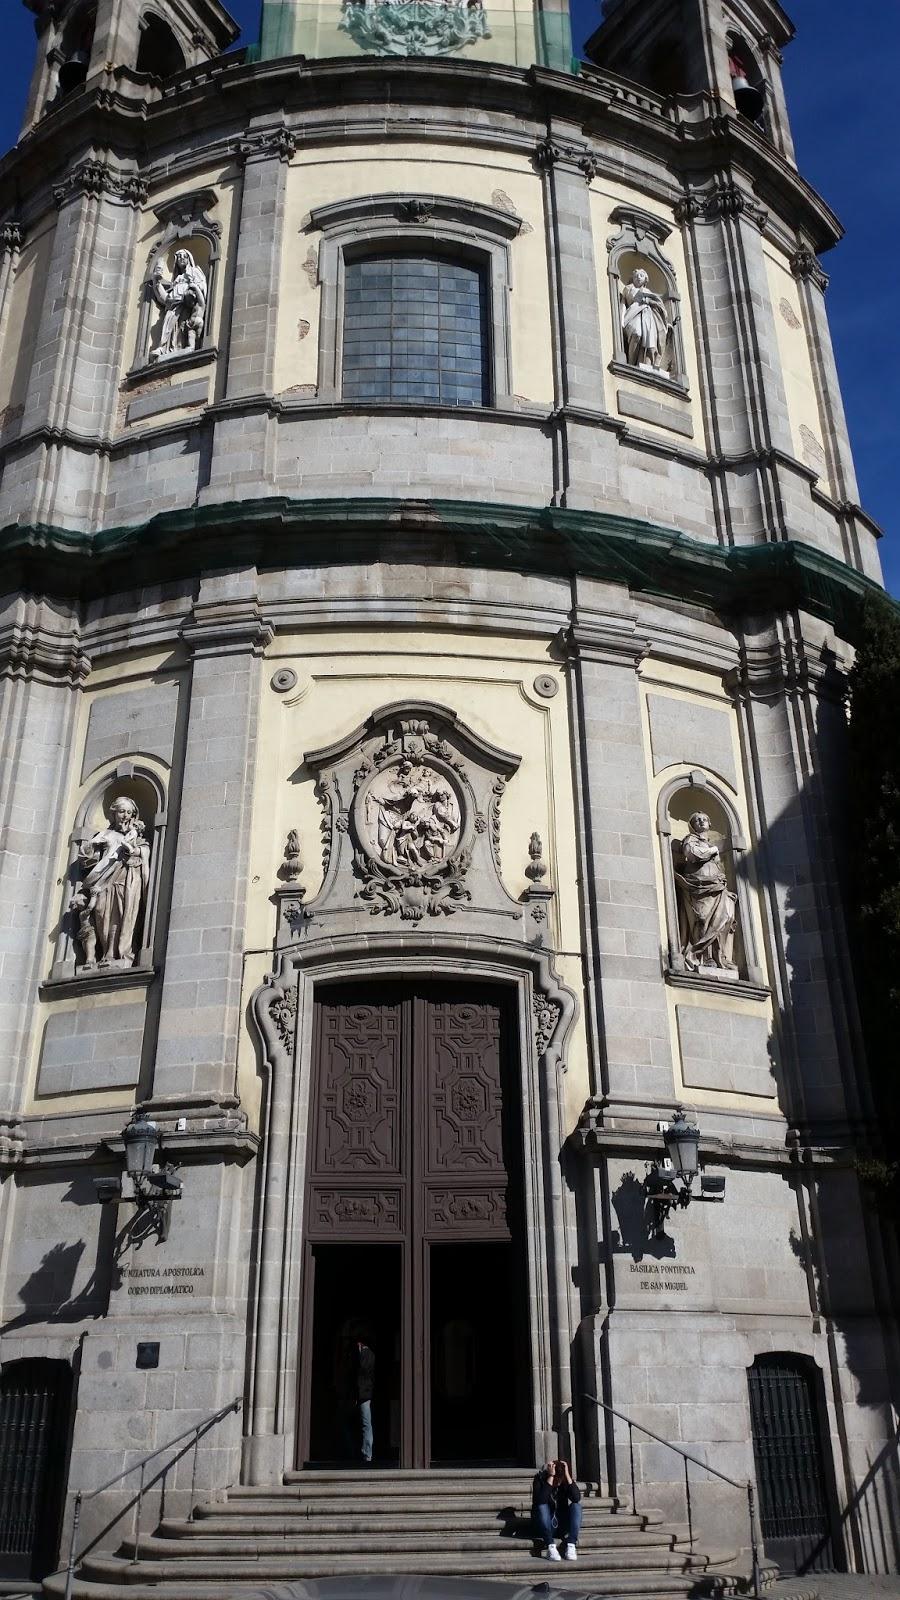 Espacio espacioso arquitectura madrile a desconocida ix for Biblioteca iglesia madrid